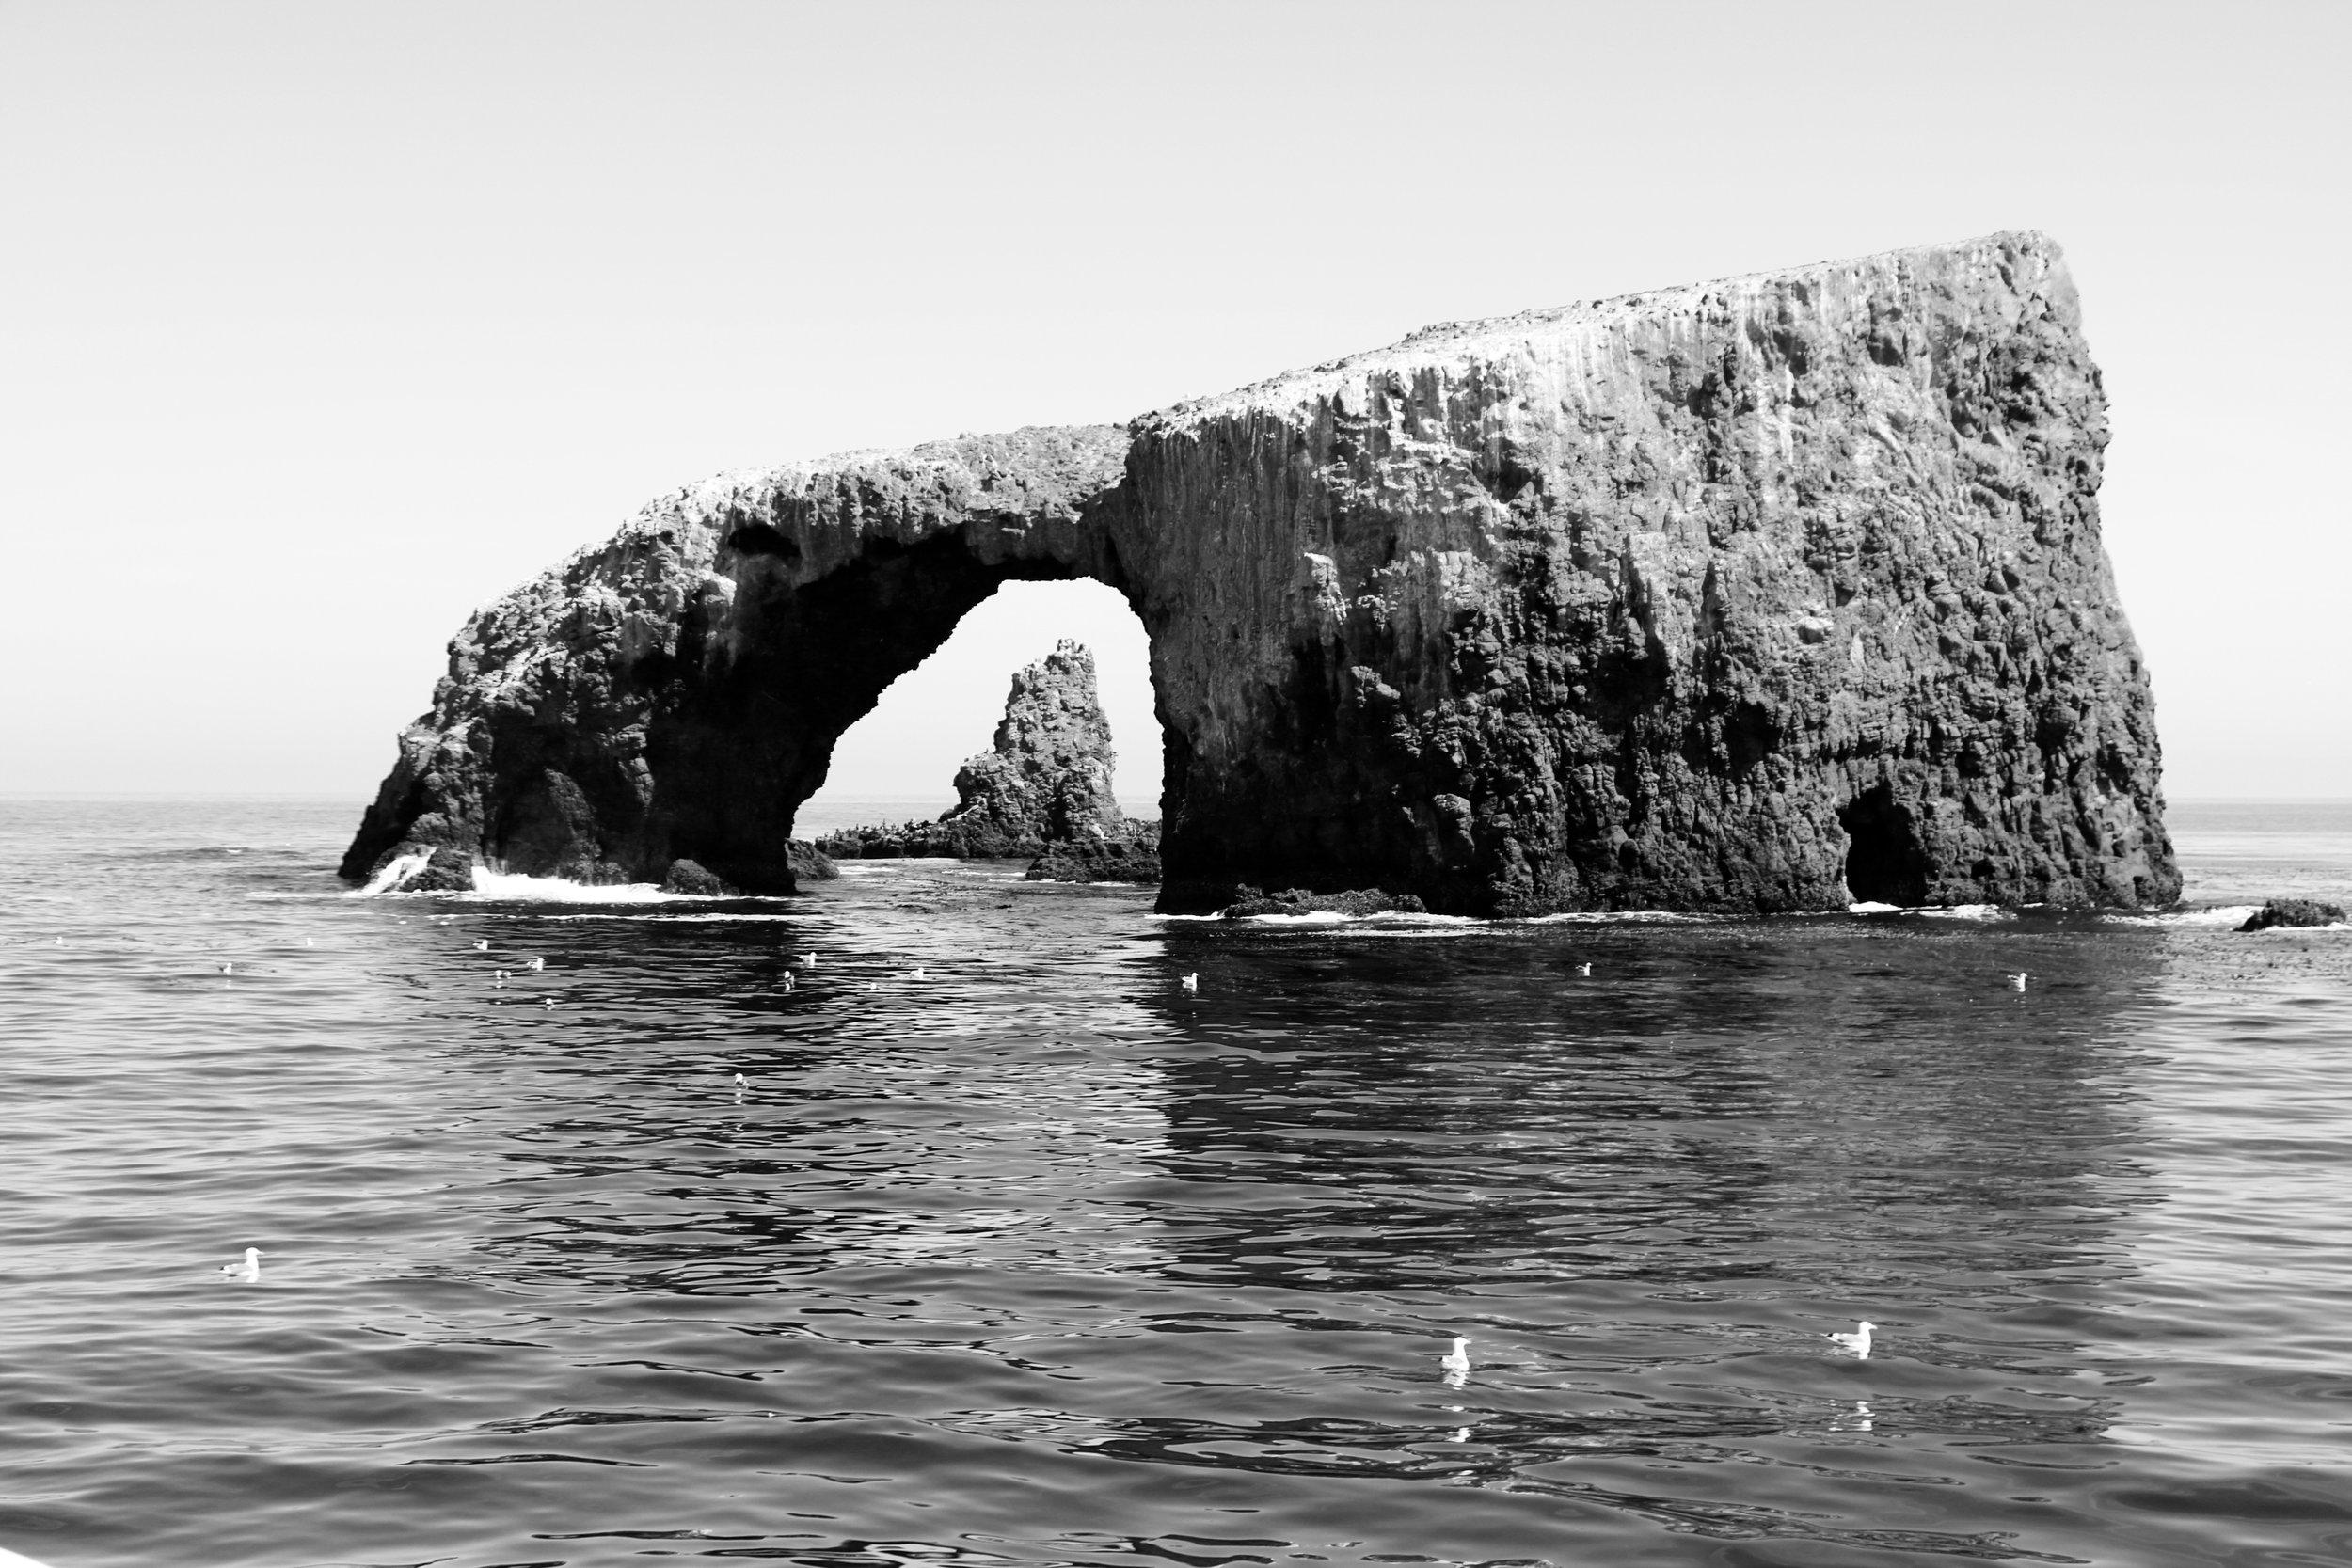 Arch Rock - Ana capa Island, Channel Islands